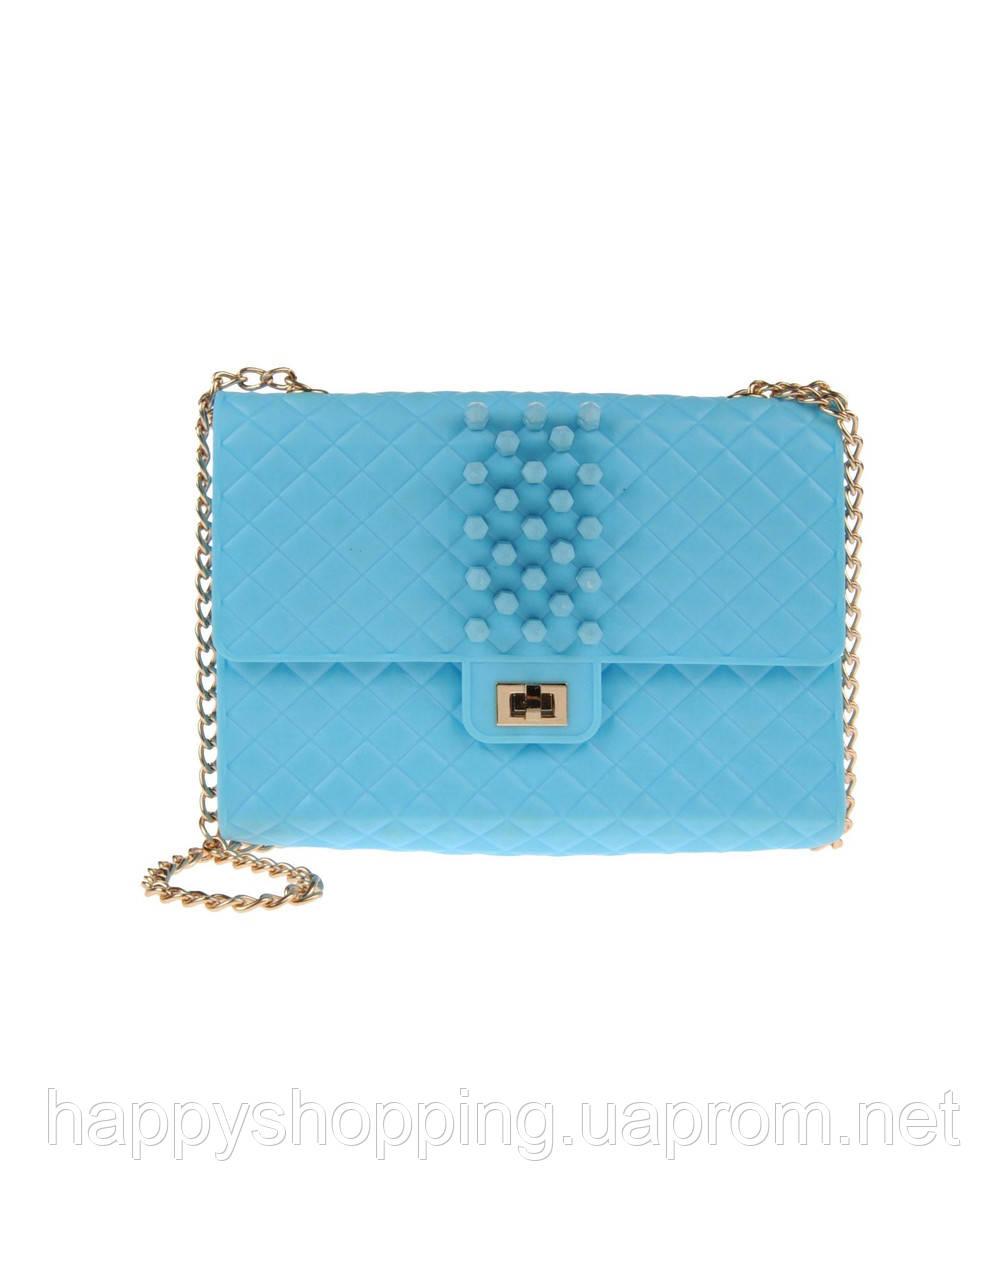 Голубая сумочка DUE DI PICCHE, фото 1